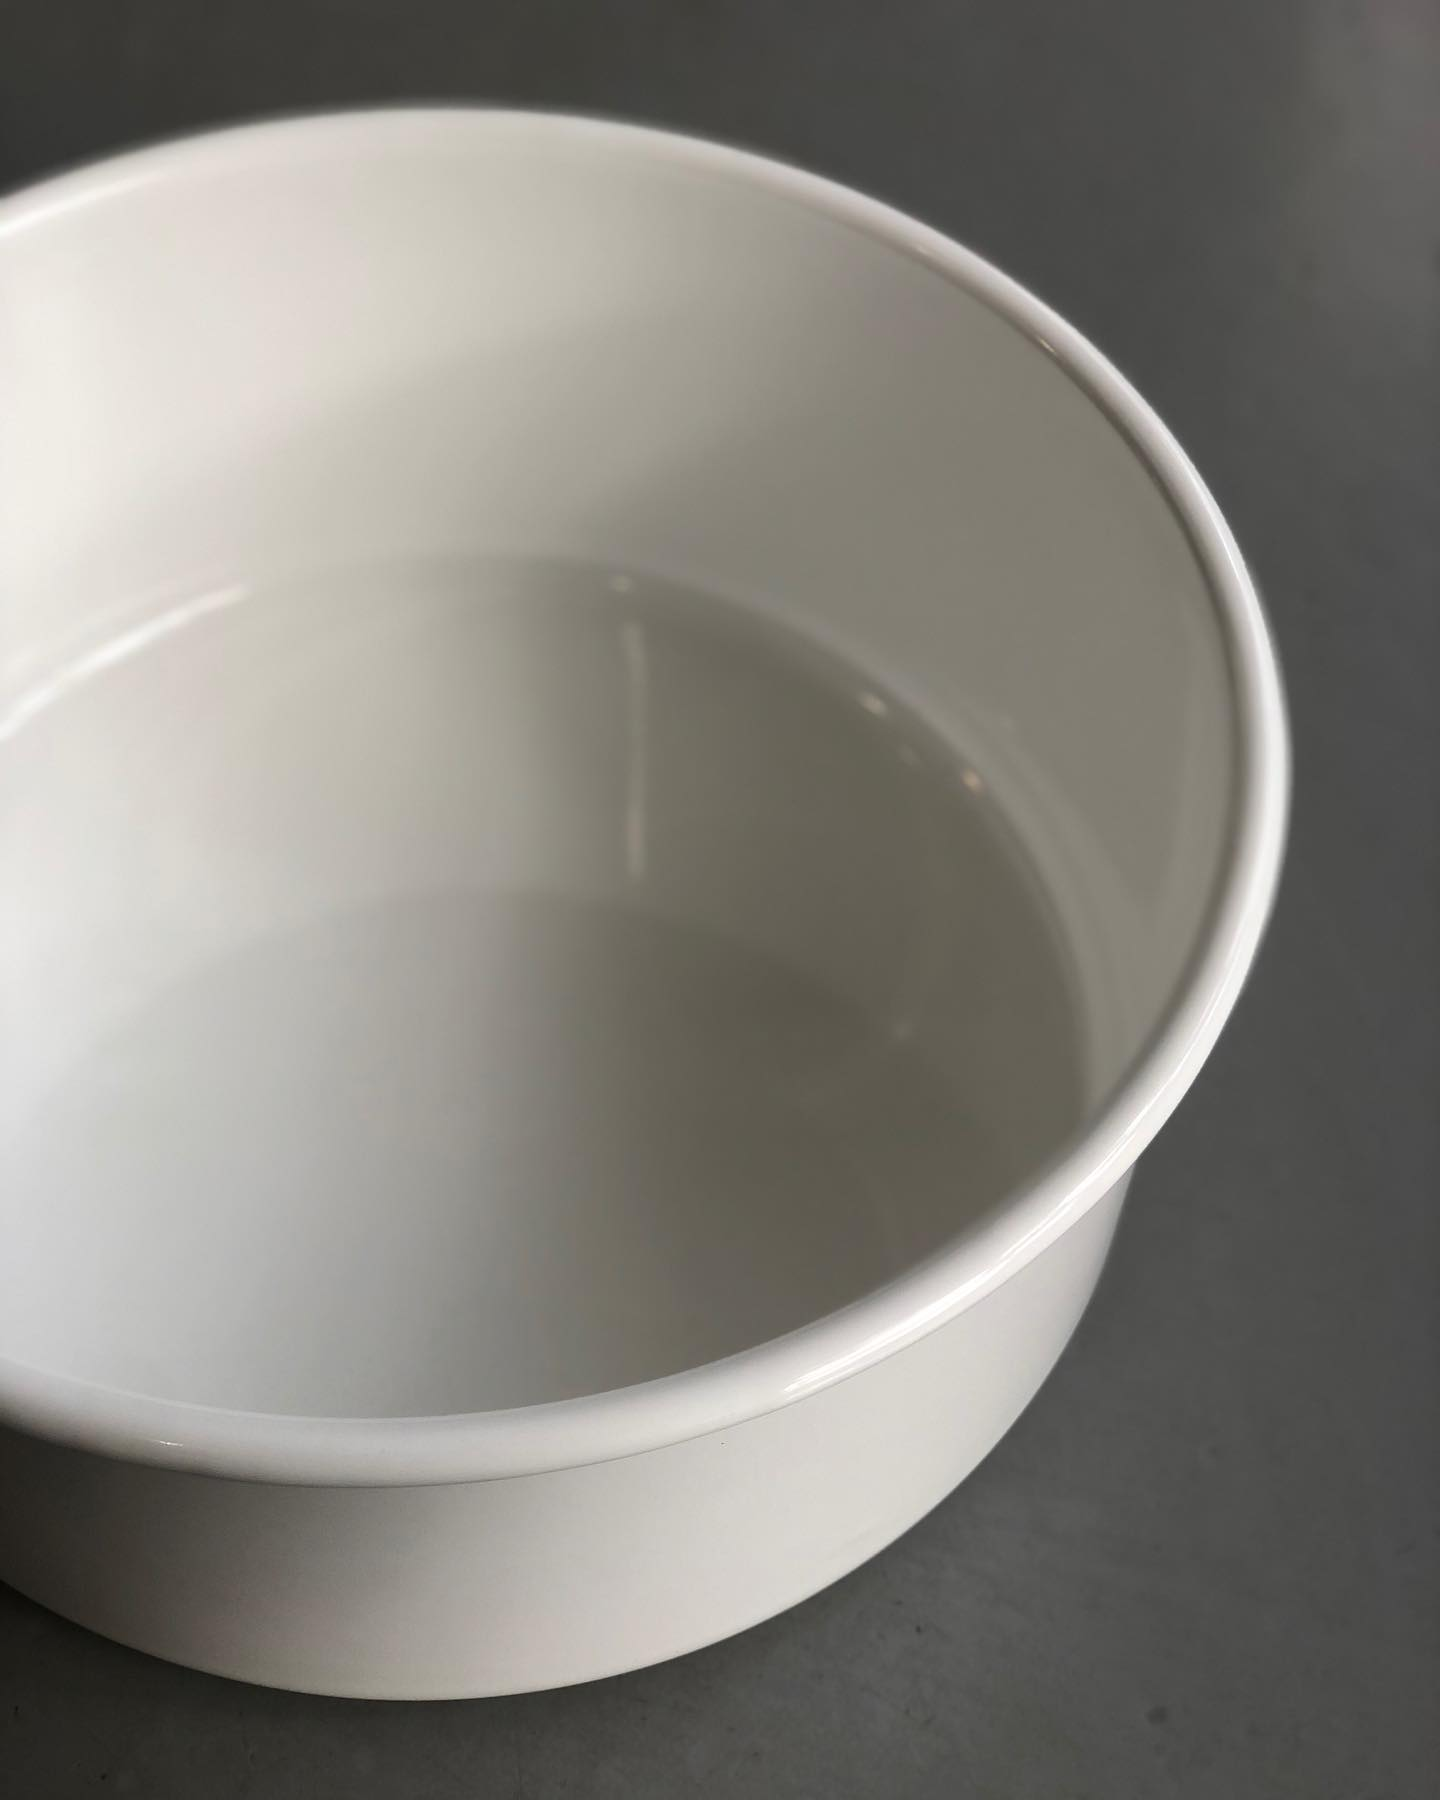 野田琺瑯 新 丸型 洗い桶